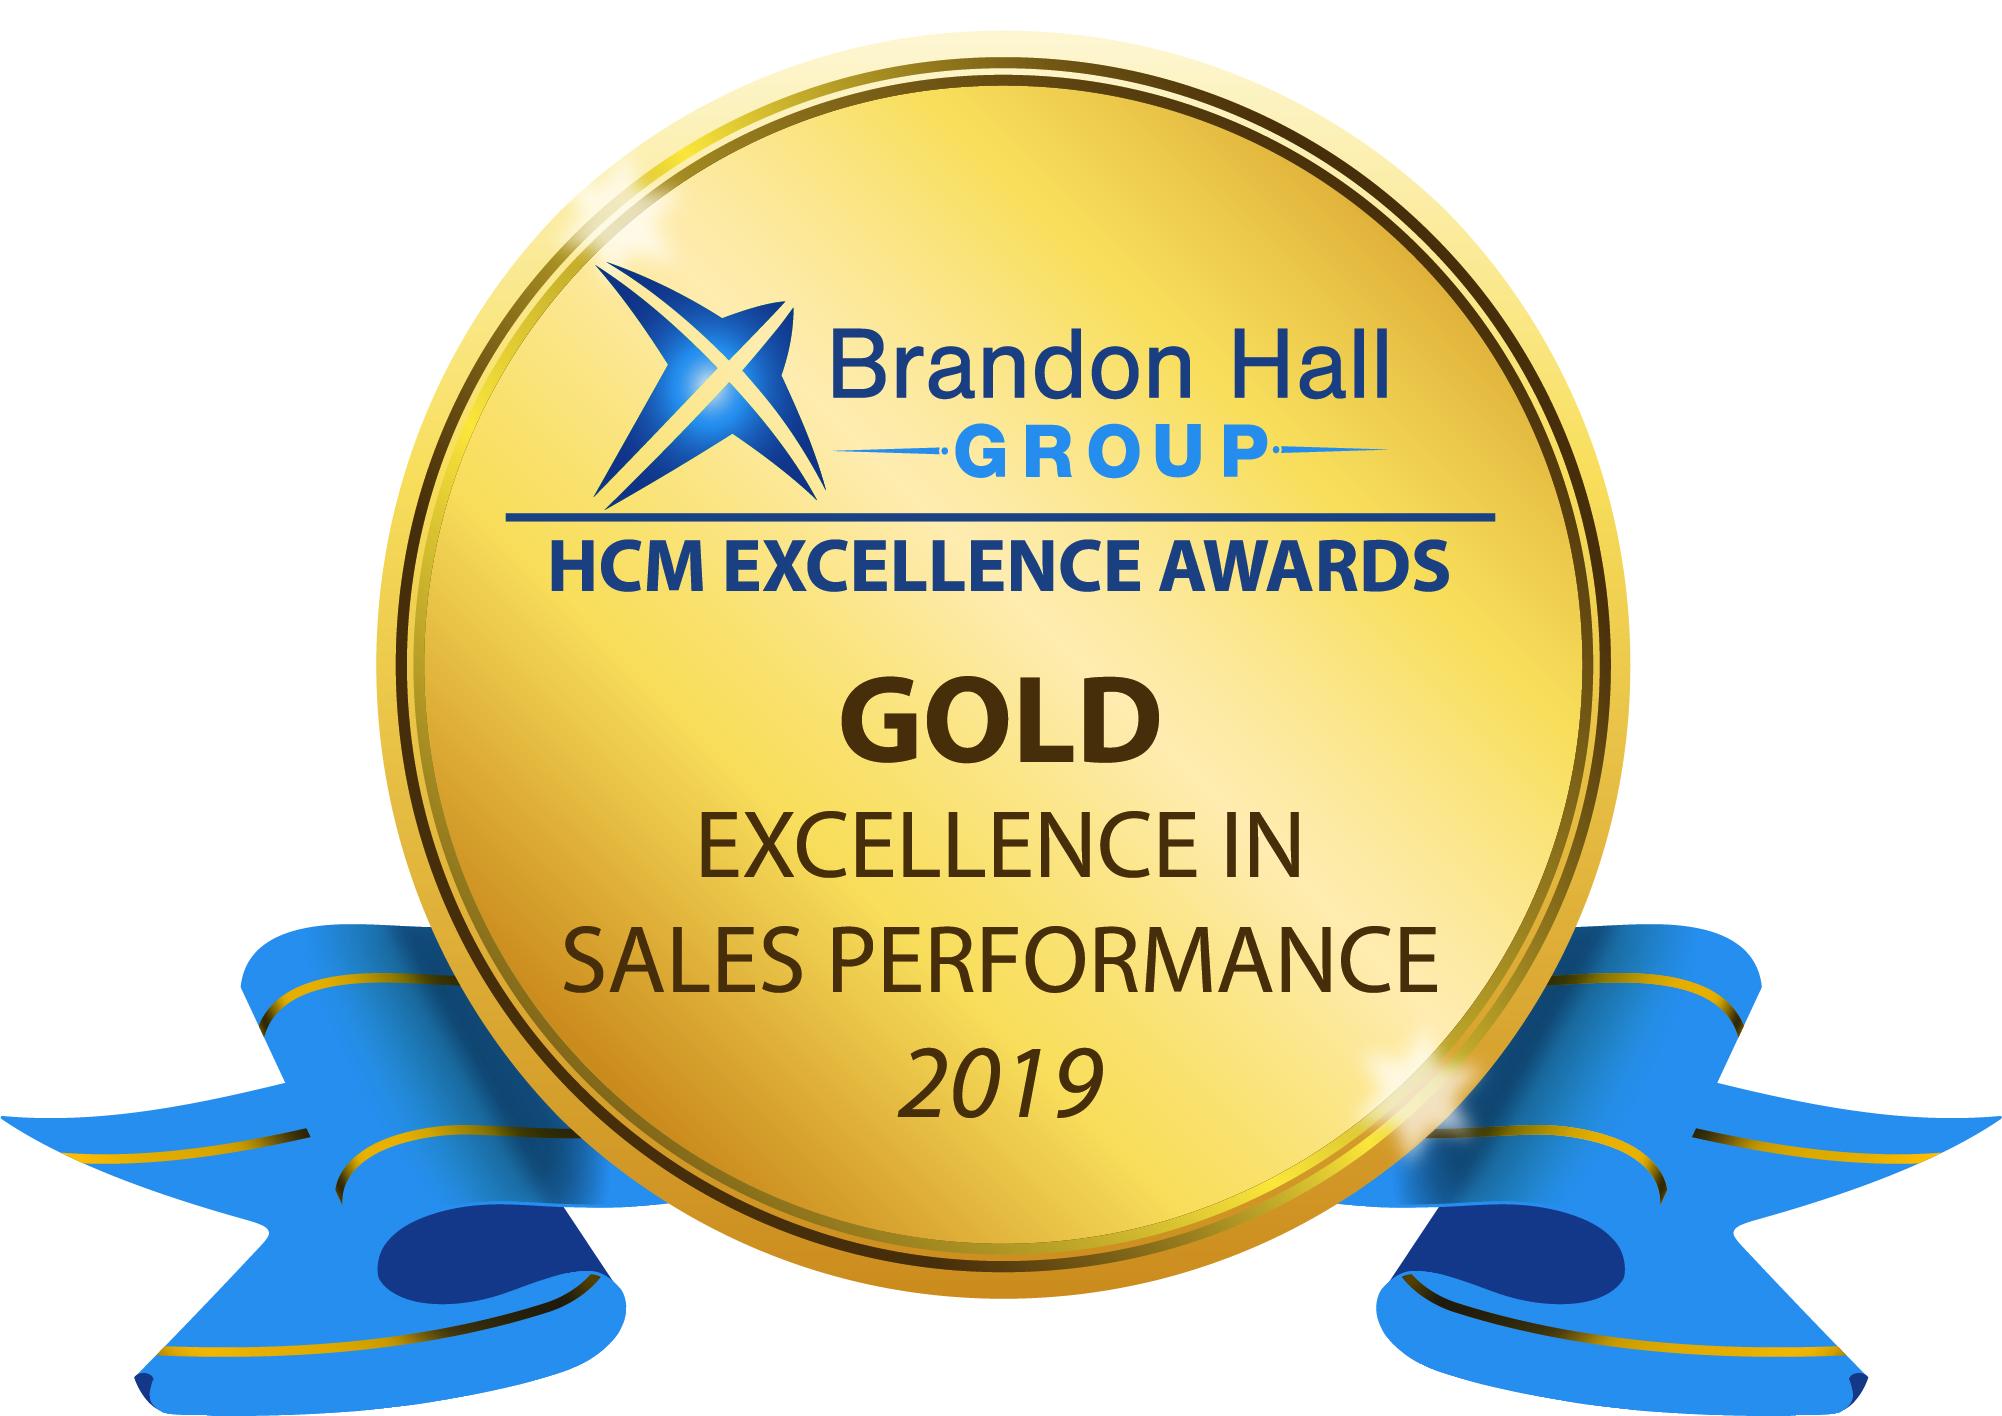 Gold-SP-Award-2019-01.jpg